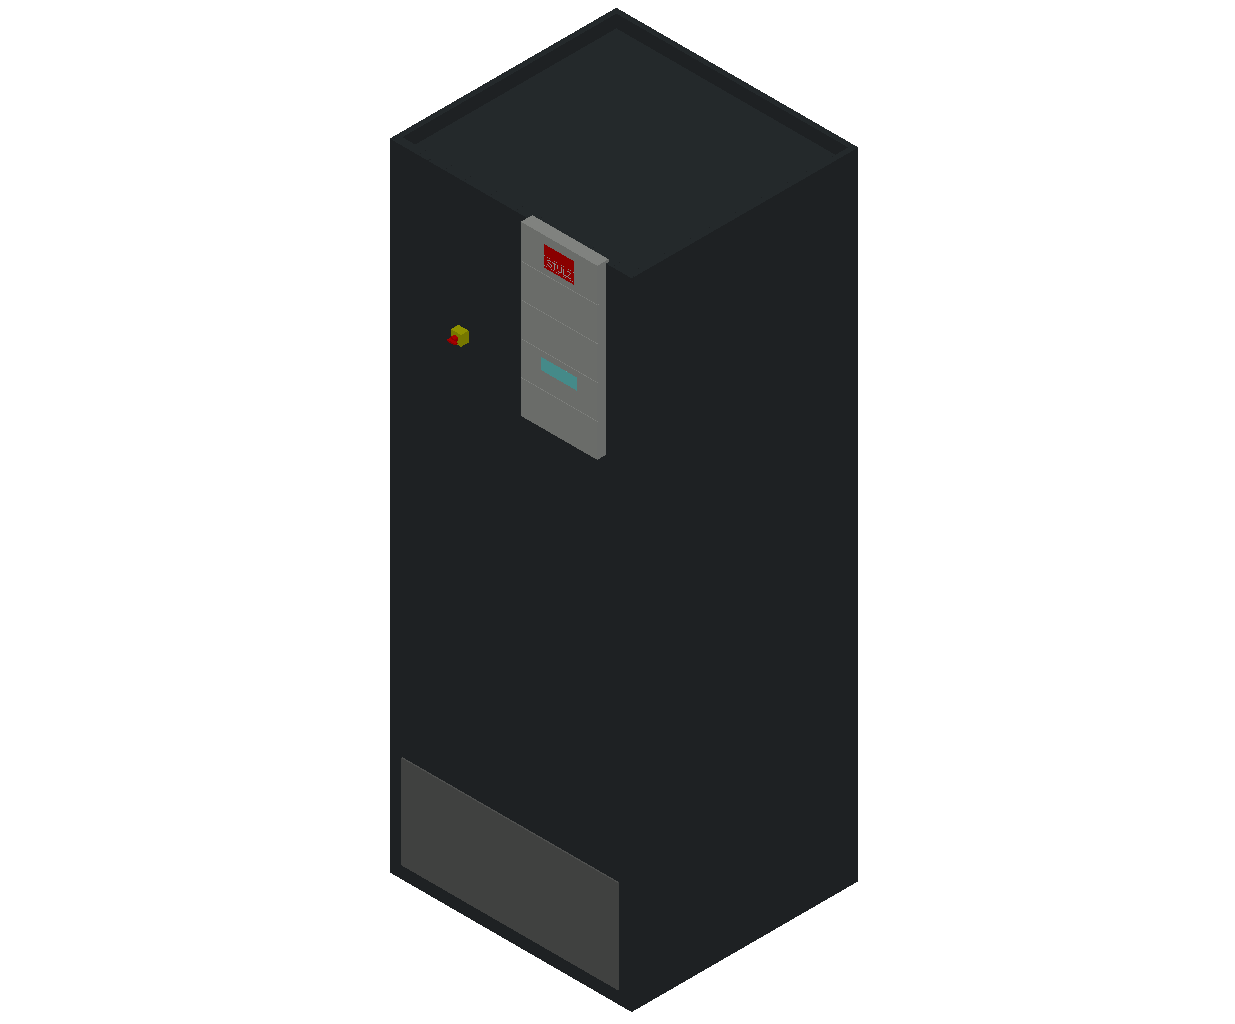 HC_Air Conditioner_Indoor Unit_MEPcontent_STULZ_CyberAir 3PRO_ASR_Single Circuit AS_ASR_271_AS_INT-EN.dwg